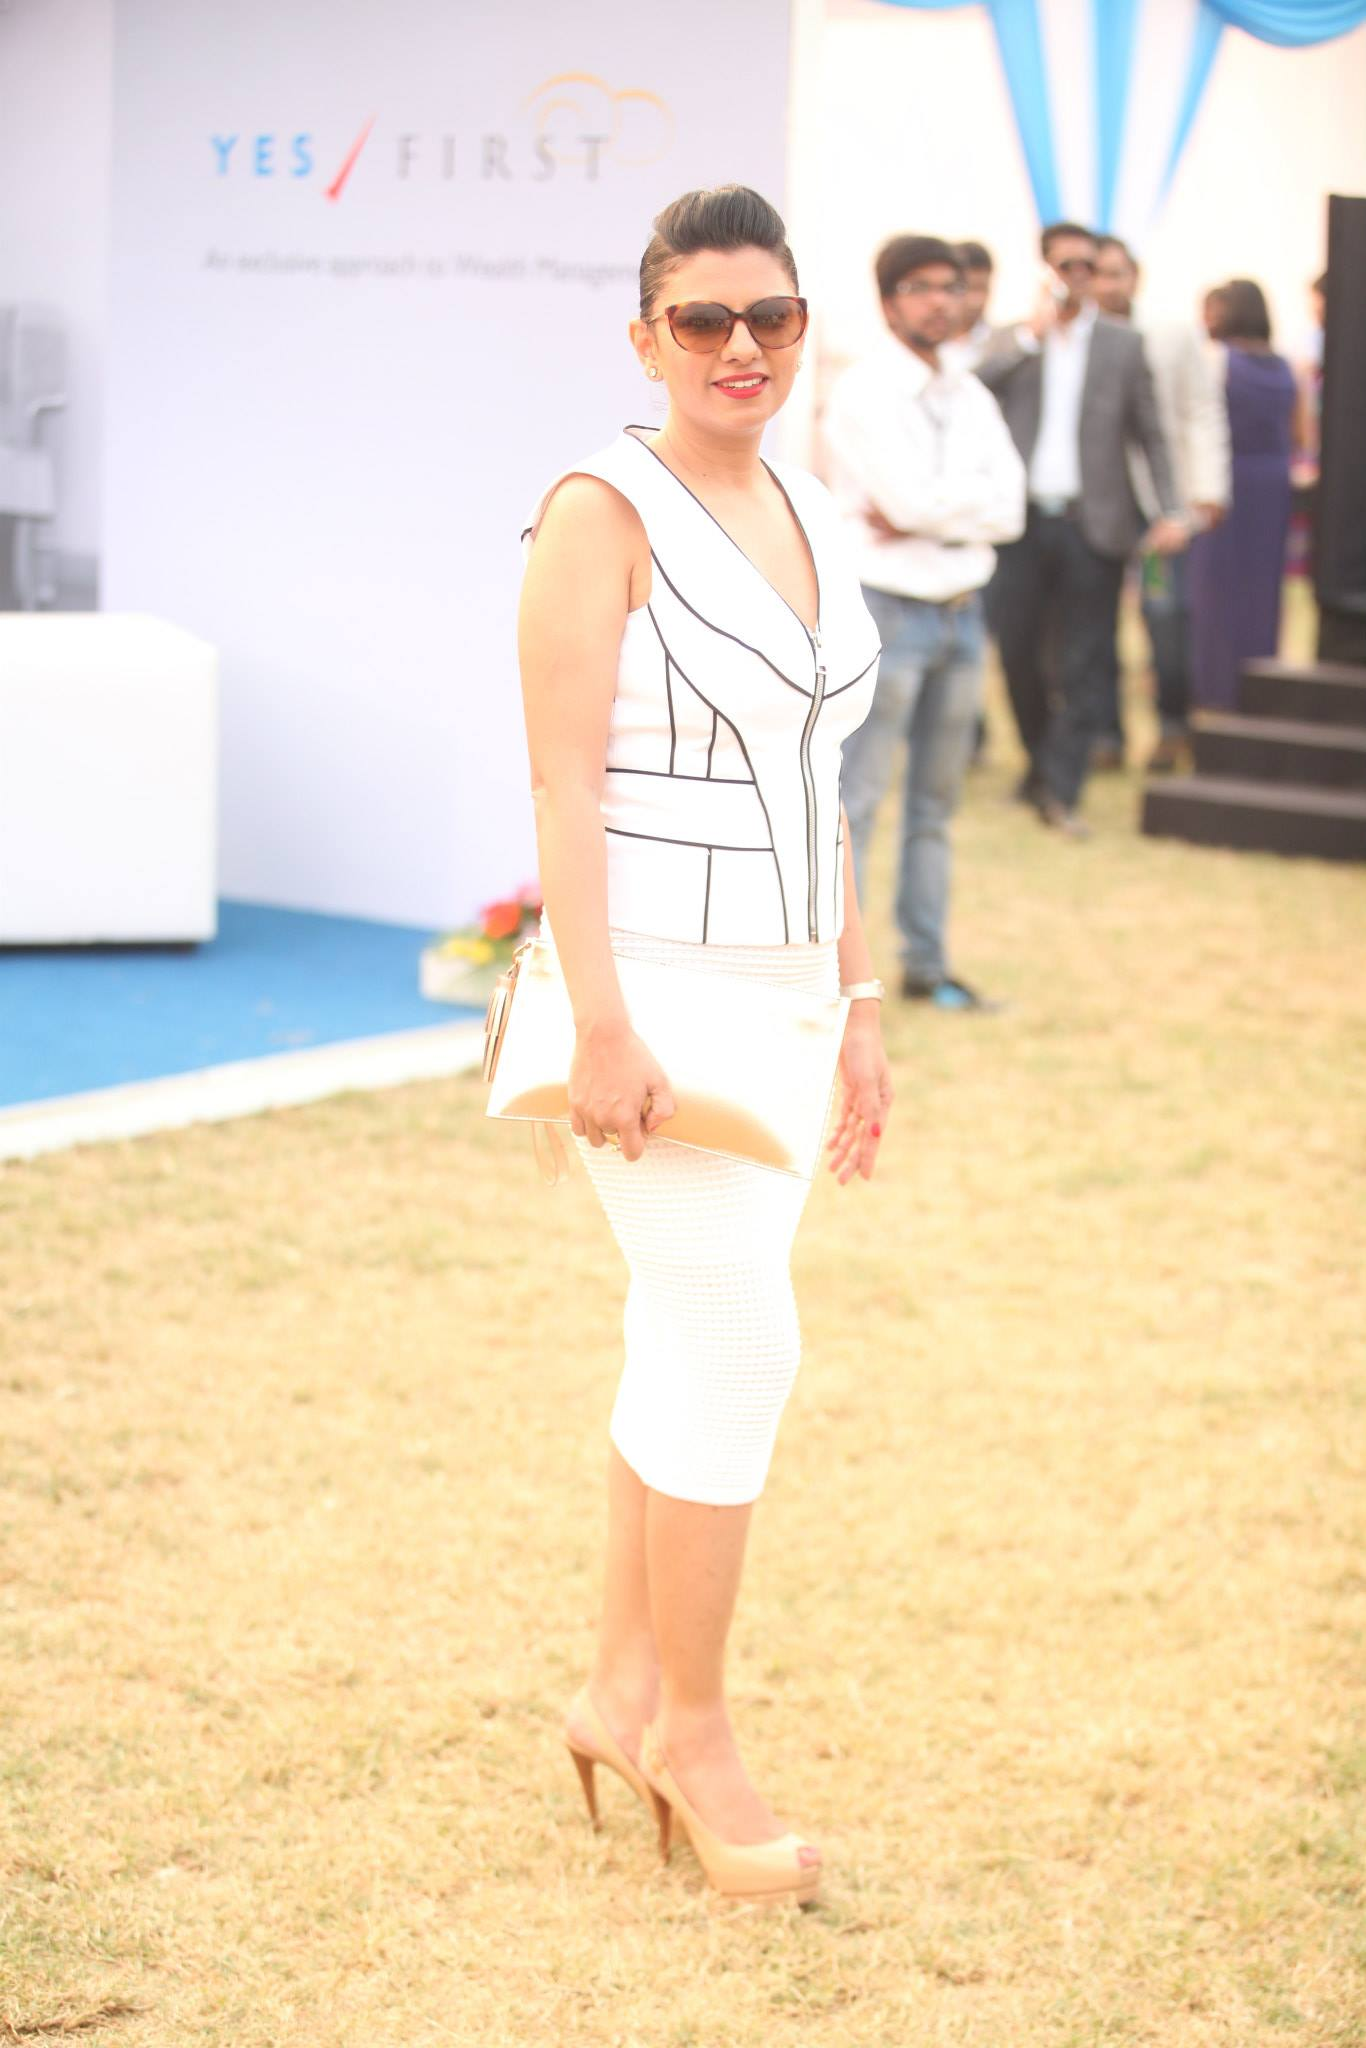 Reema Sanghvi